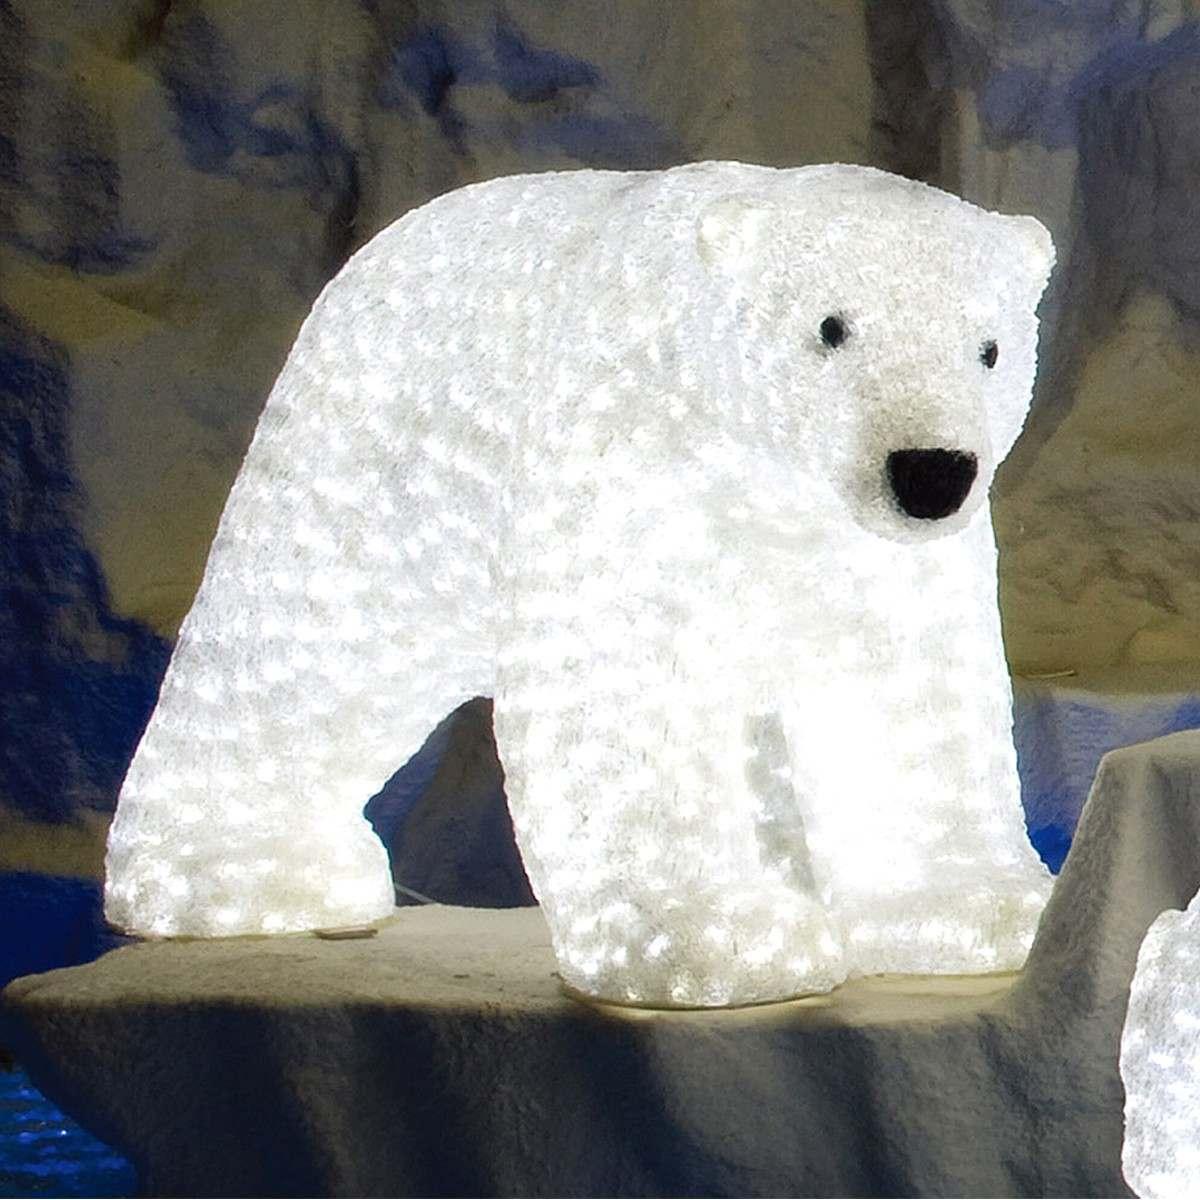 Commercial Christmas Decorations Florida: 1.1cm Outdoor Femal Polar Bear Figure, 1540 White LEDs